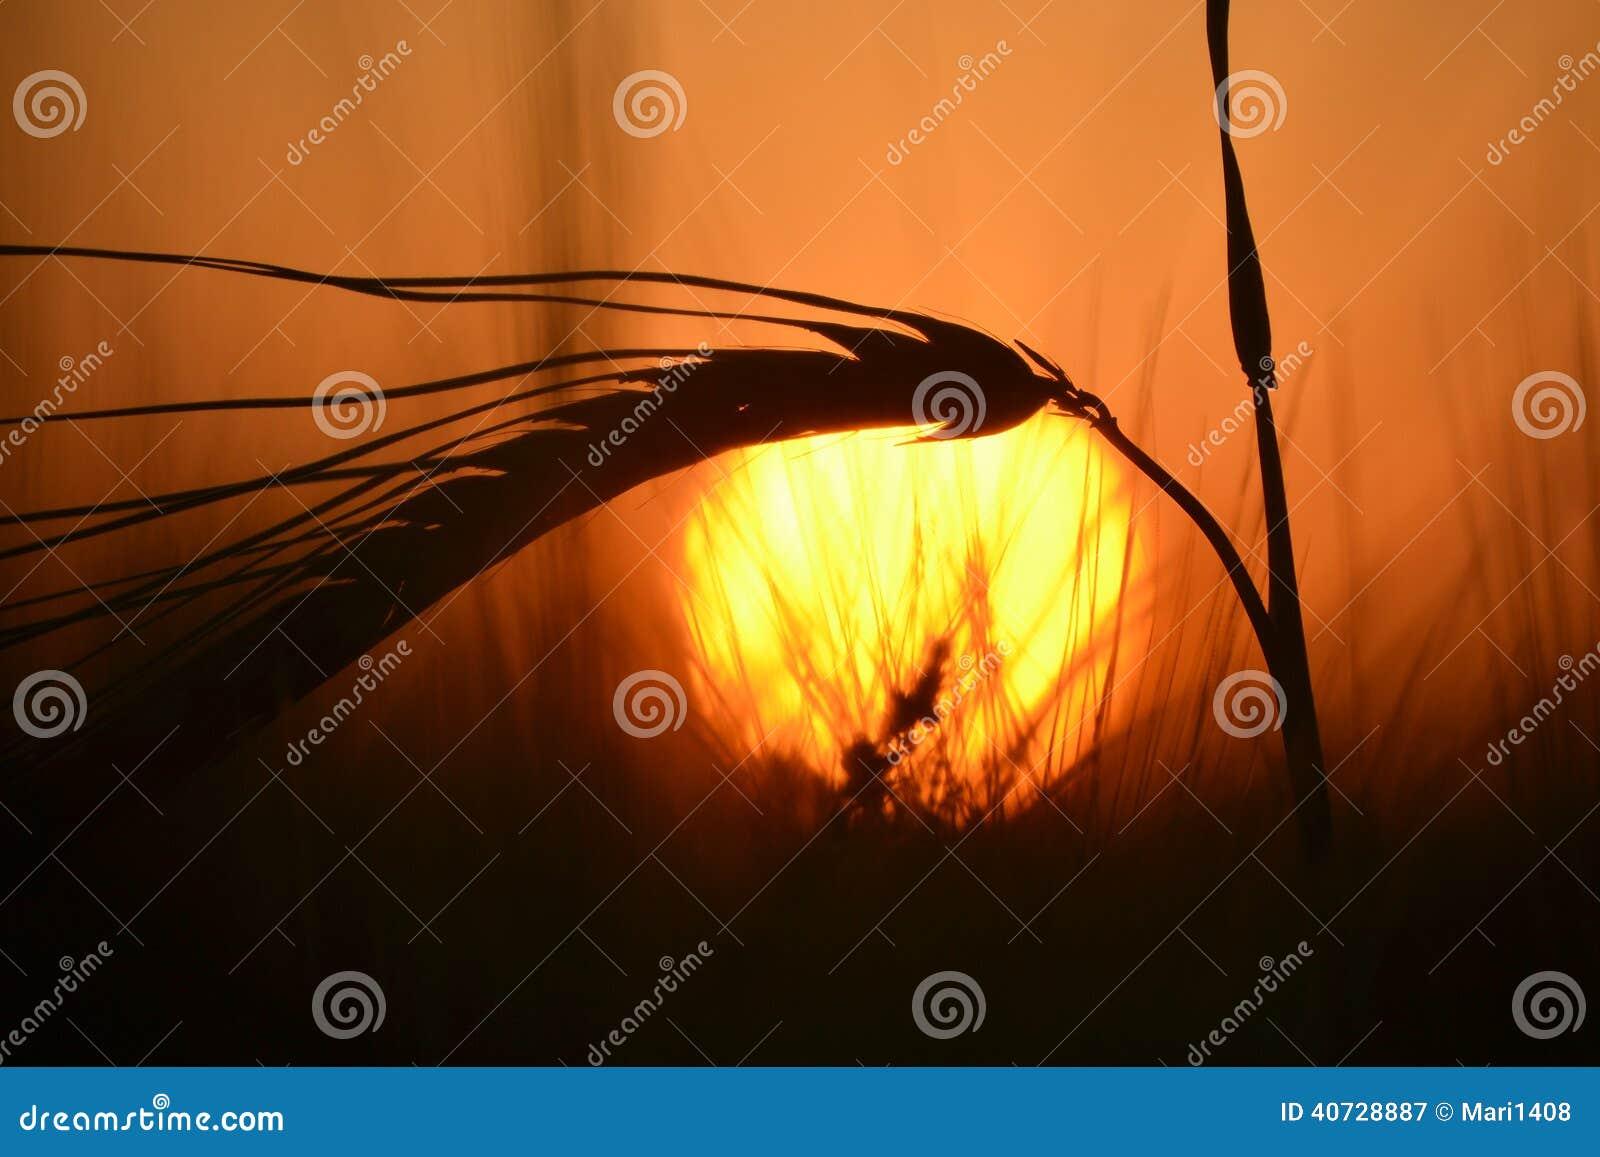 Stalk of grain at sunset